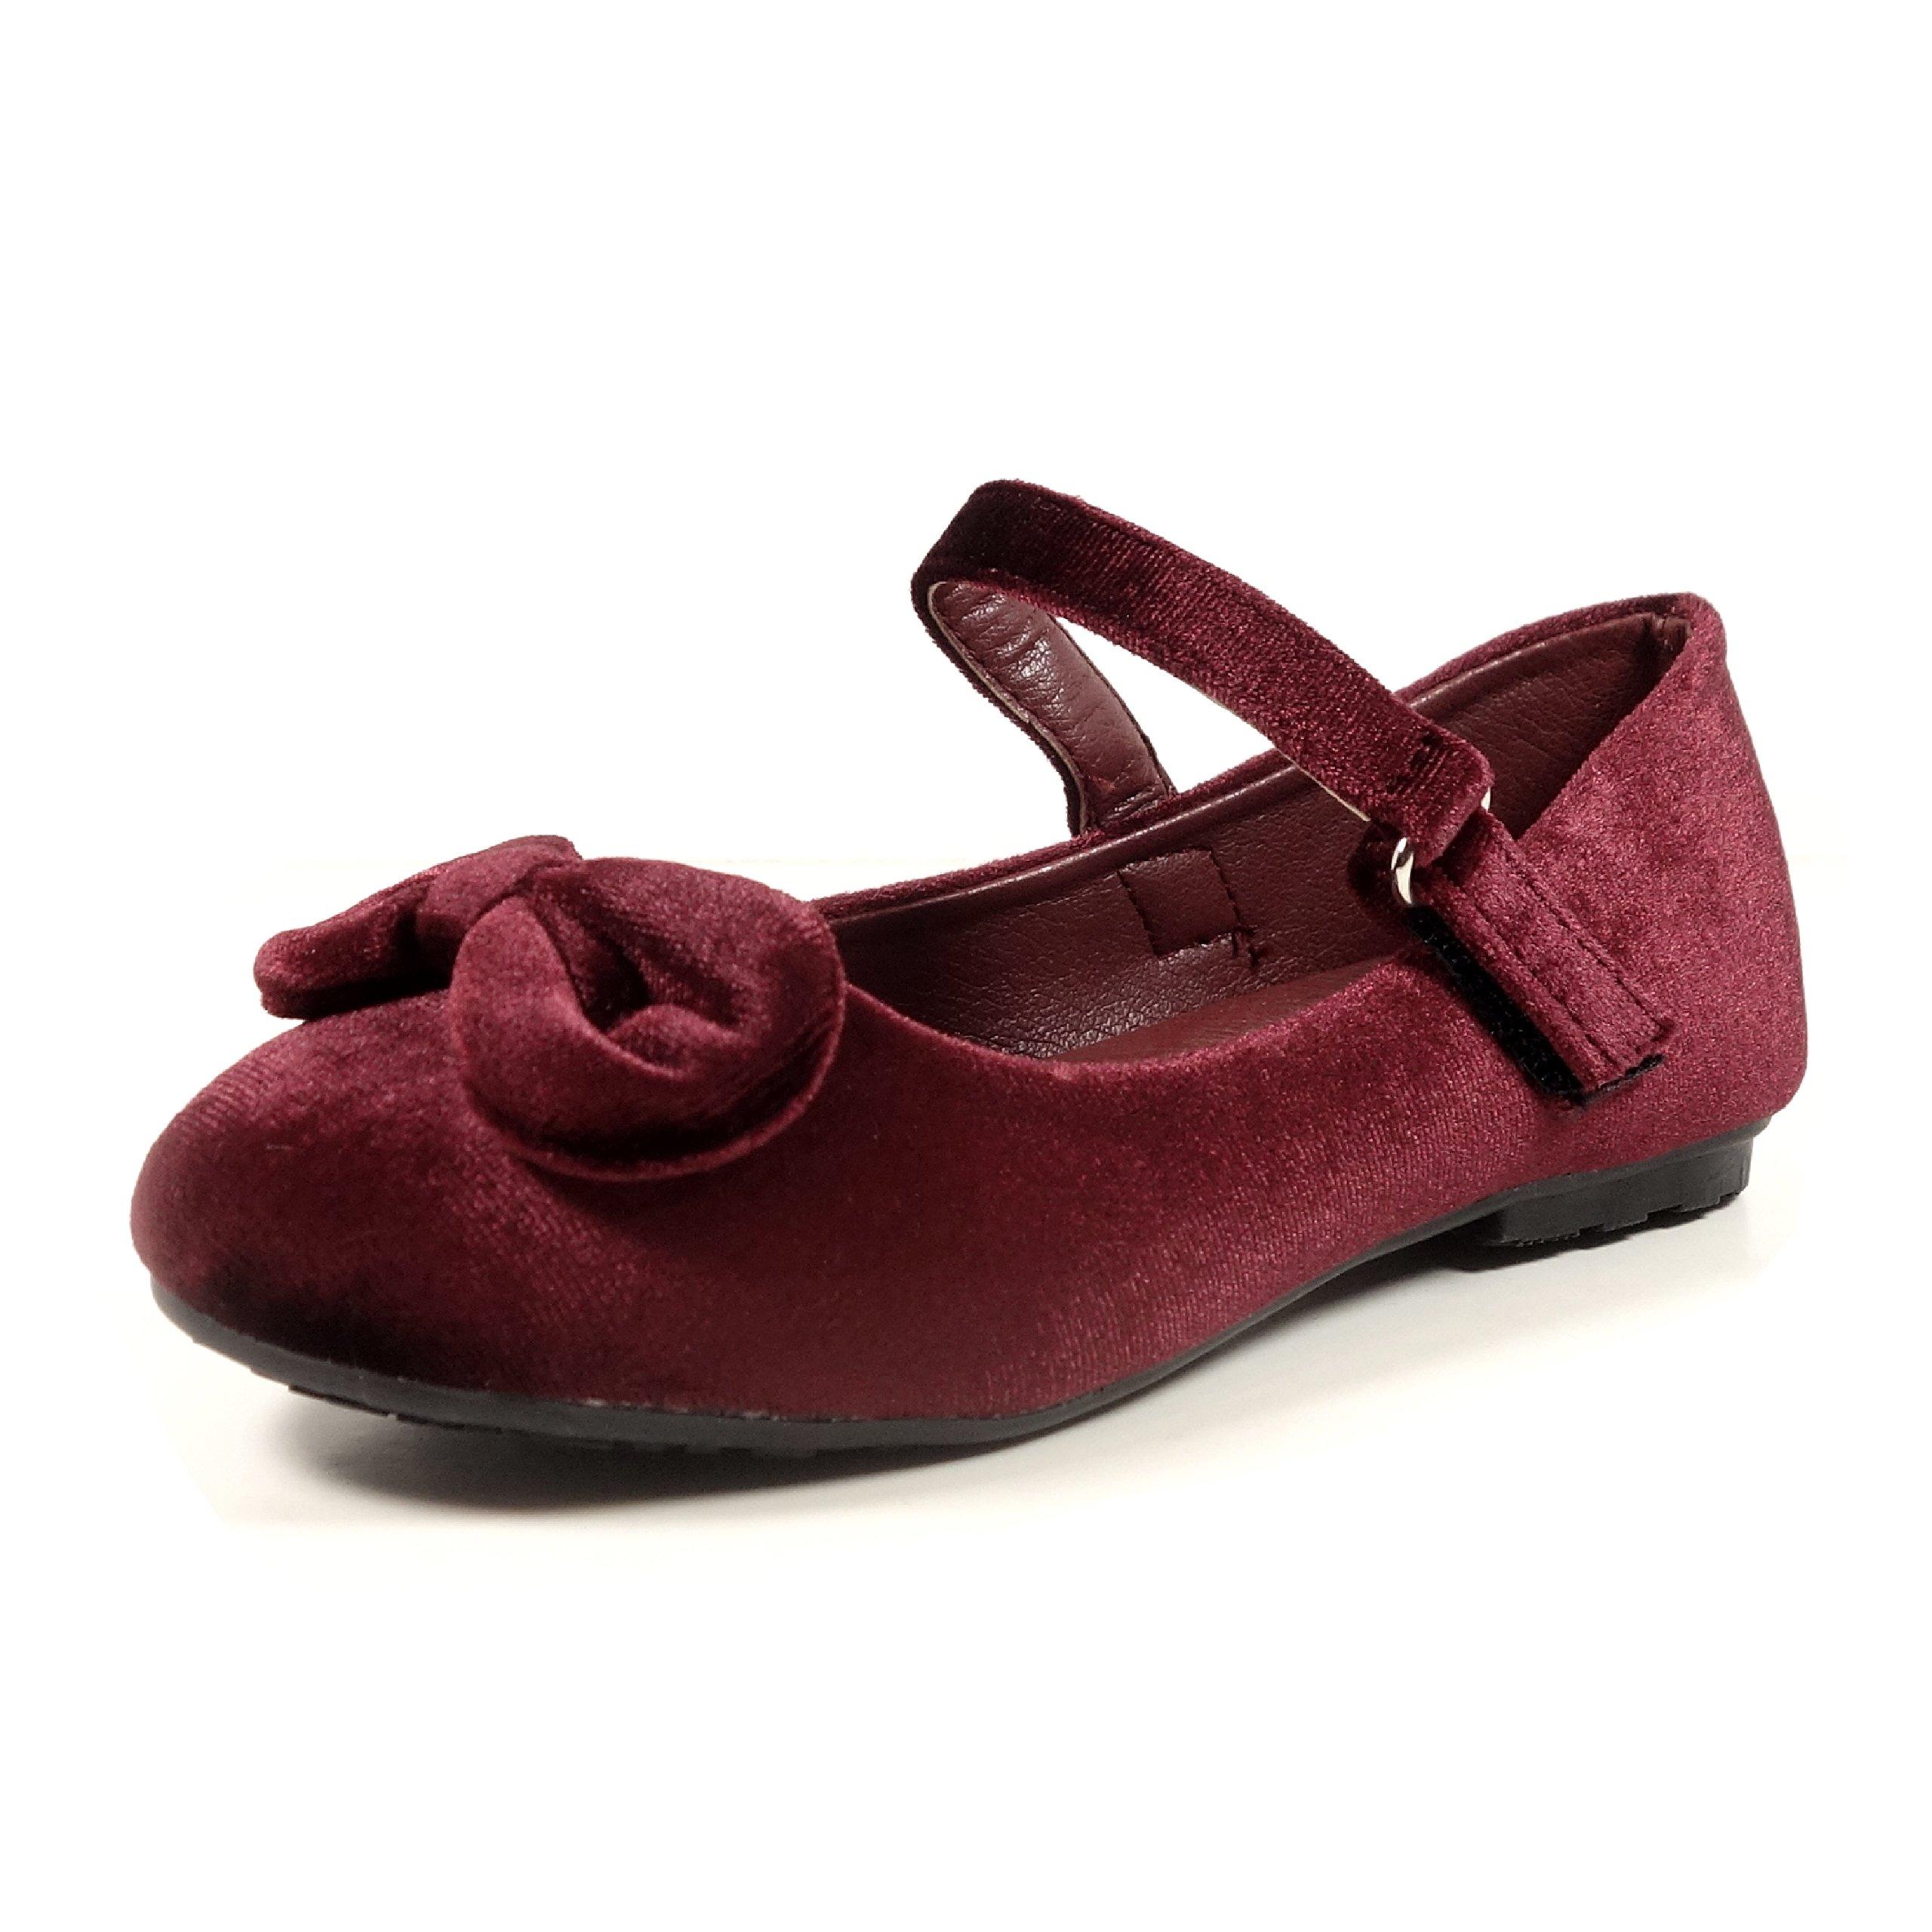 558d6ab6f647 Galleon - Nova Utopia Toddler Little Girls Ballet Flat Shoes